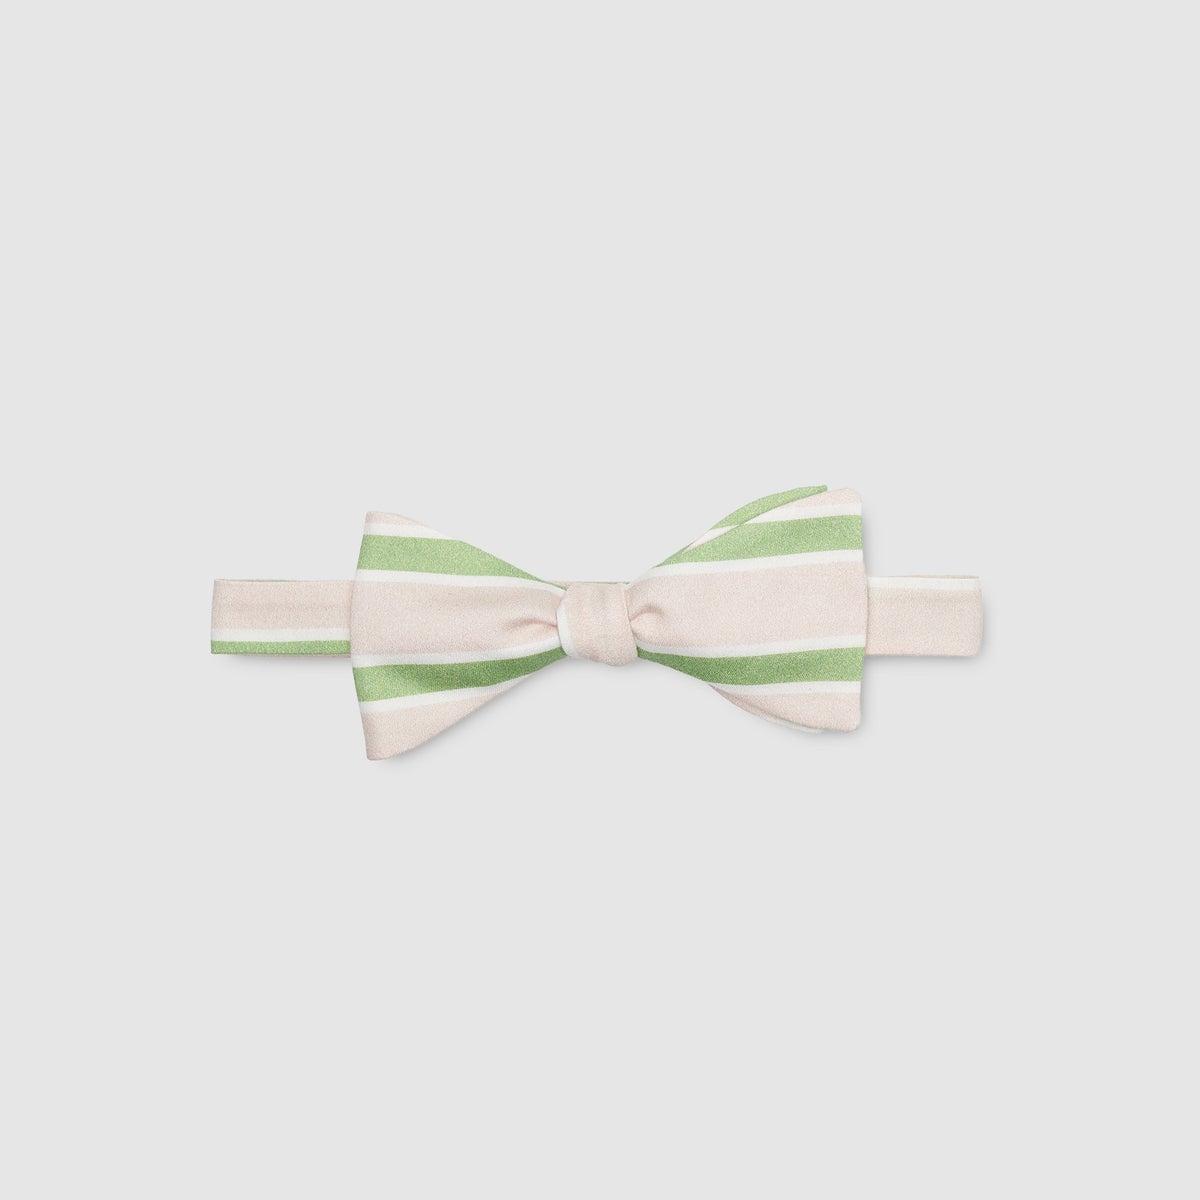 Image of FLEX - the bow tie